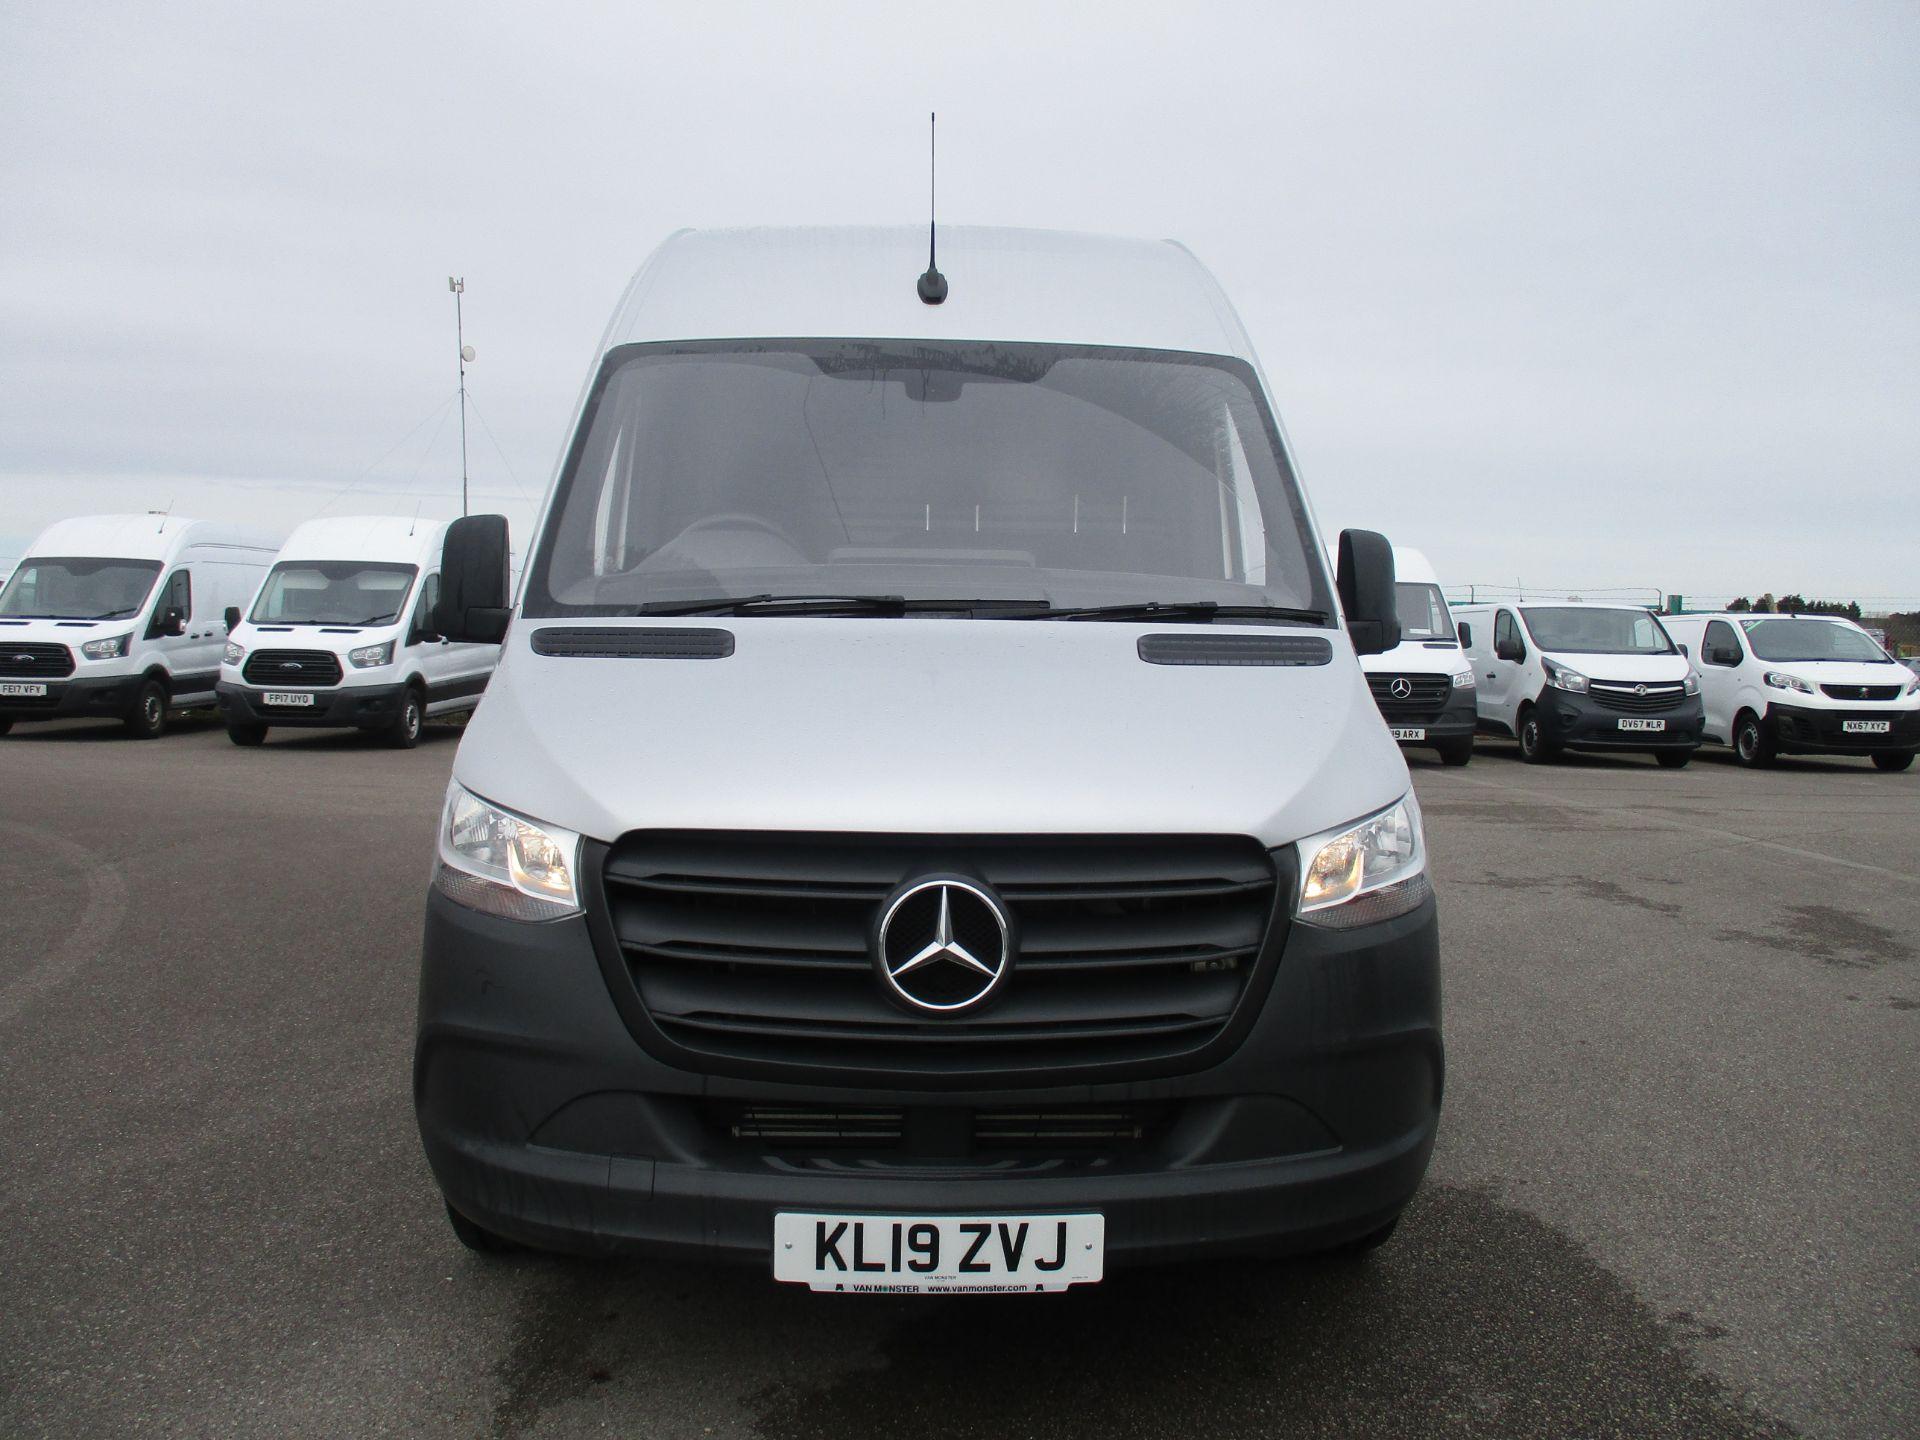 2019 Mercedes-Benz Sprinter 314 CDI L2 H2 140 PS VAN EURO 6 (KL19ZVJ) Image 2